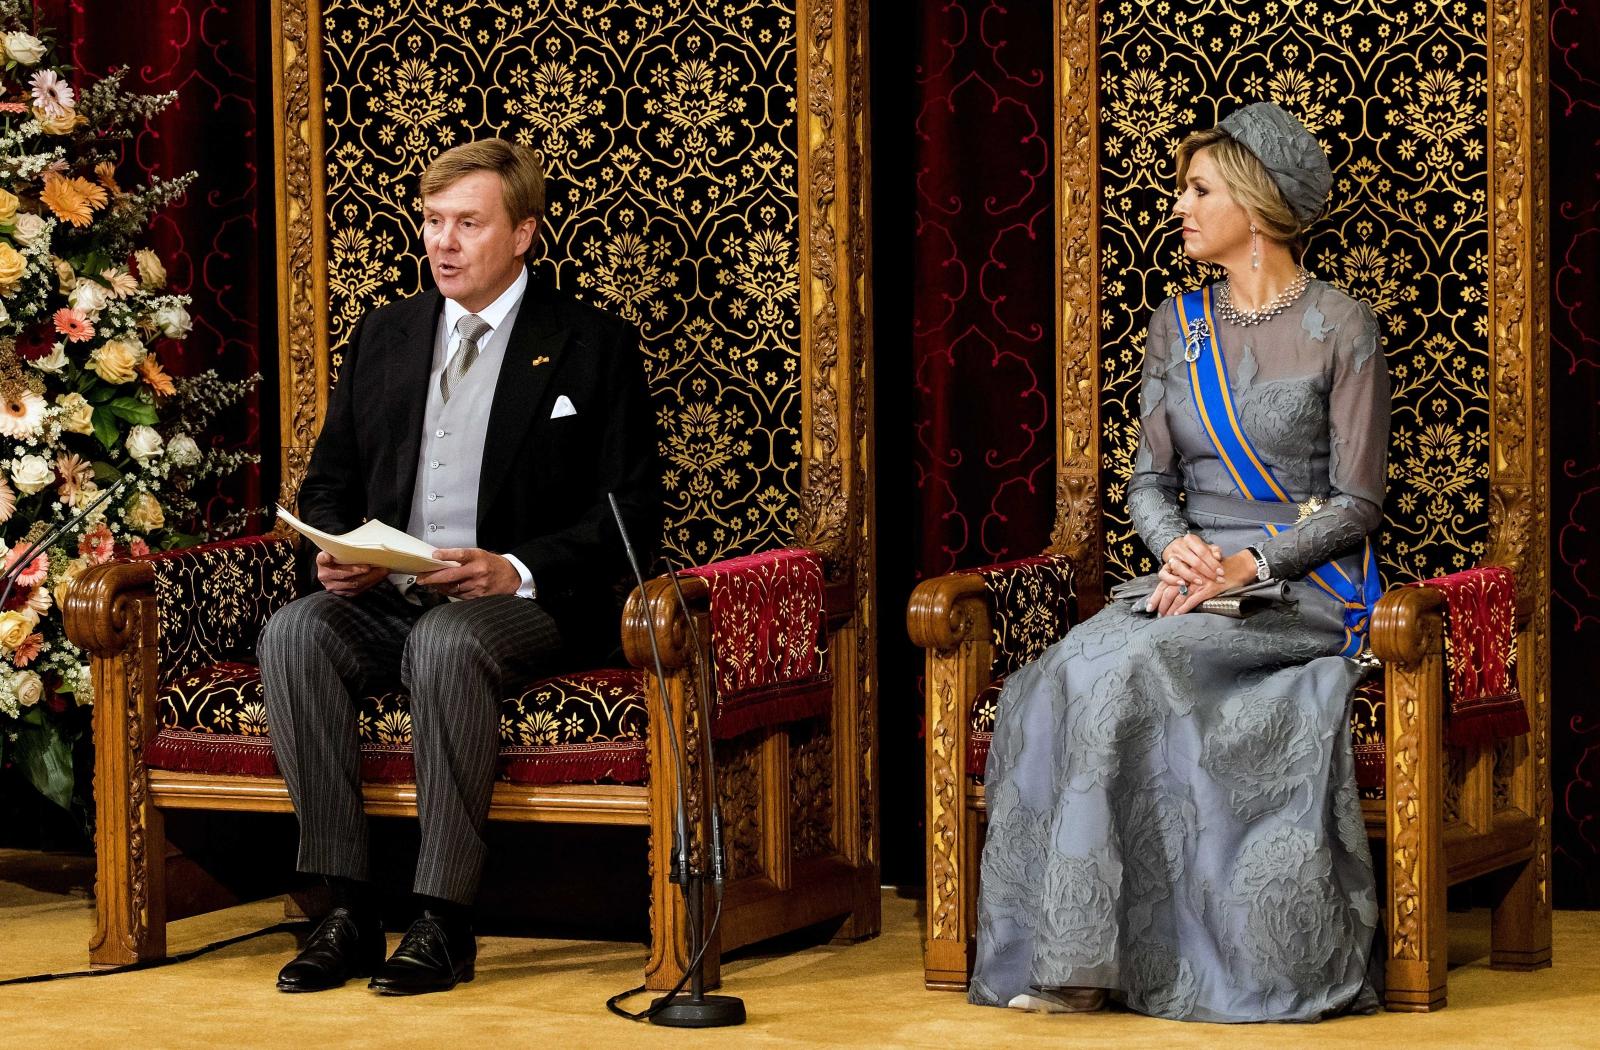 Dzień Książęcy w Holandii EPA/KOEN VAN WEEL